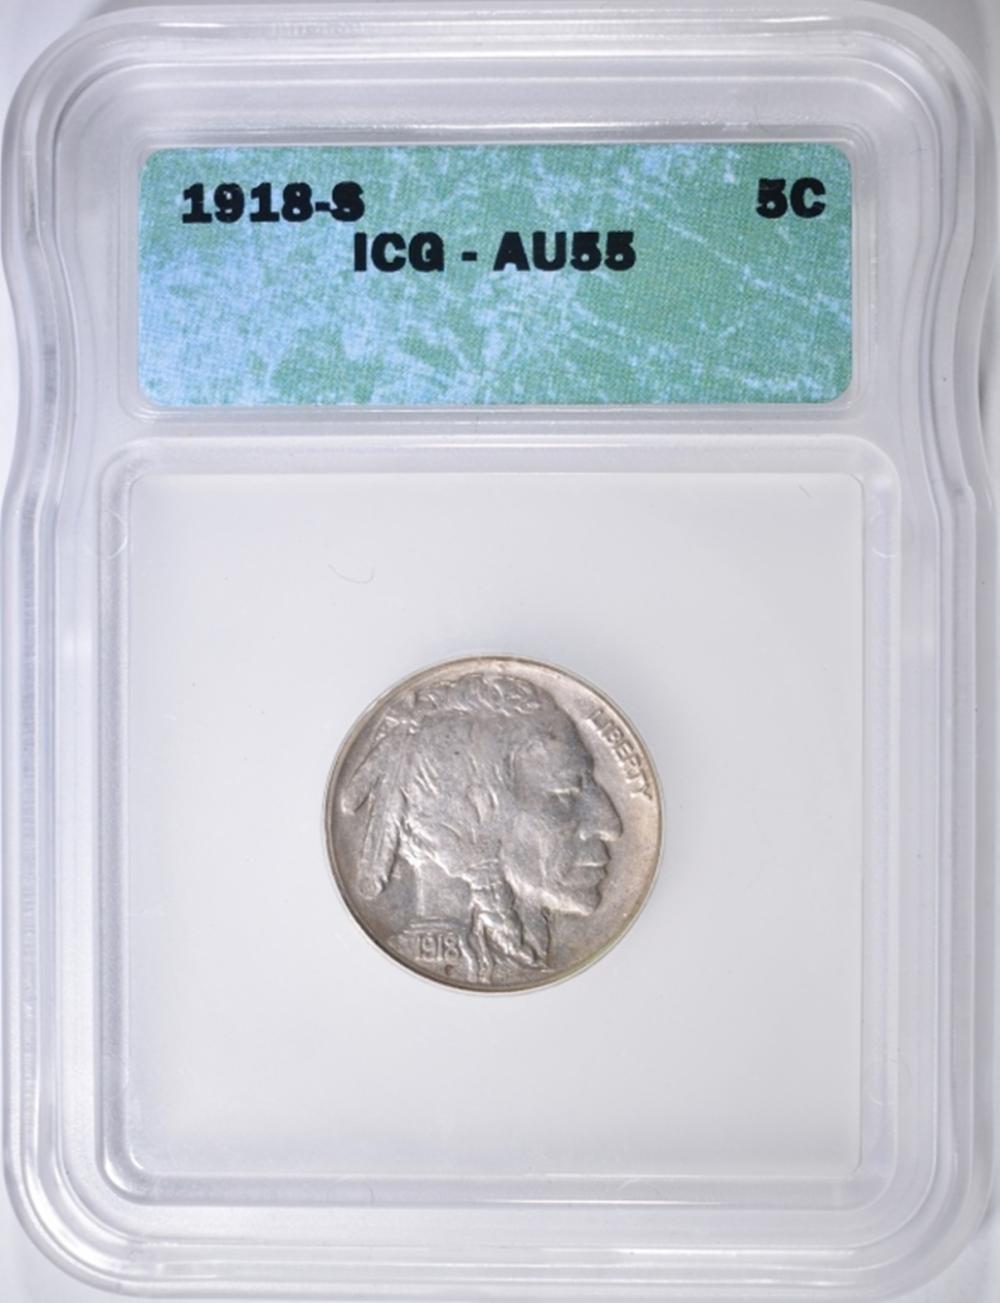 Lot 398: 1918-S BUFFALO NICKEL ICG AU-55